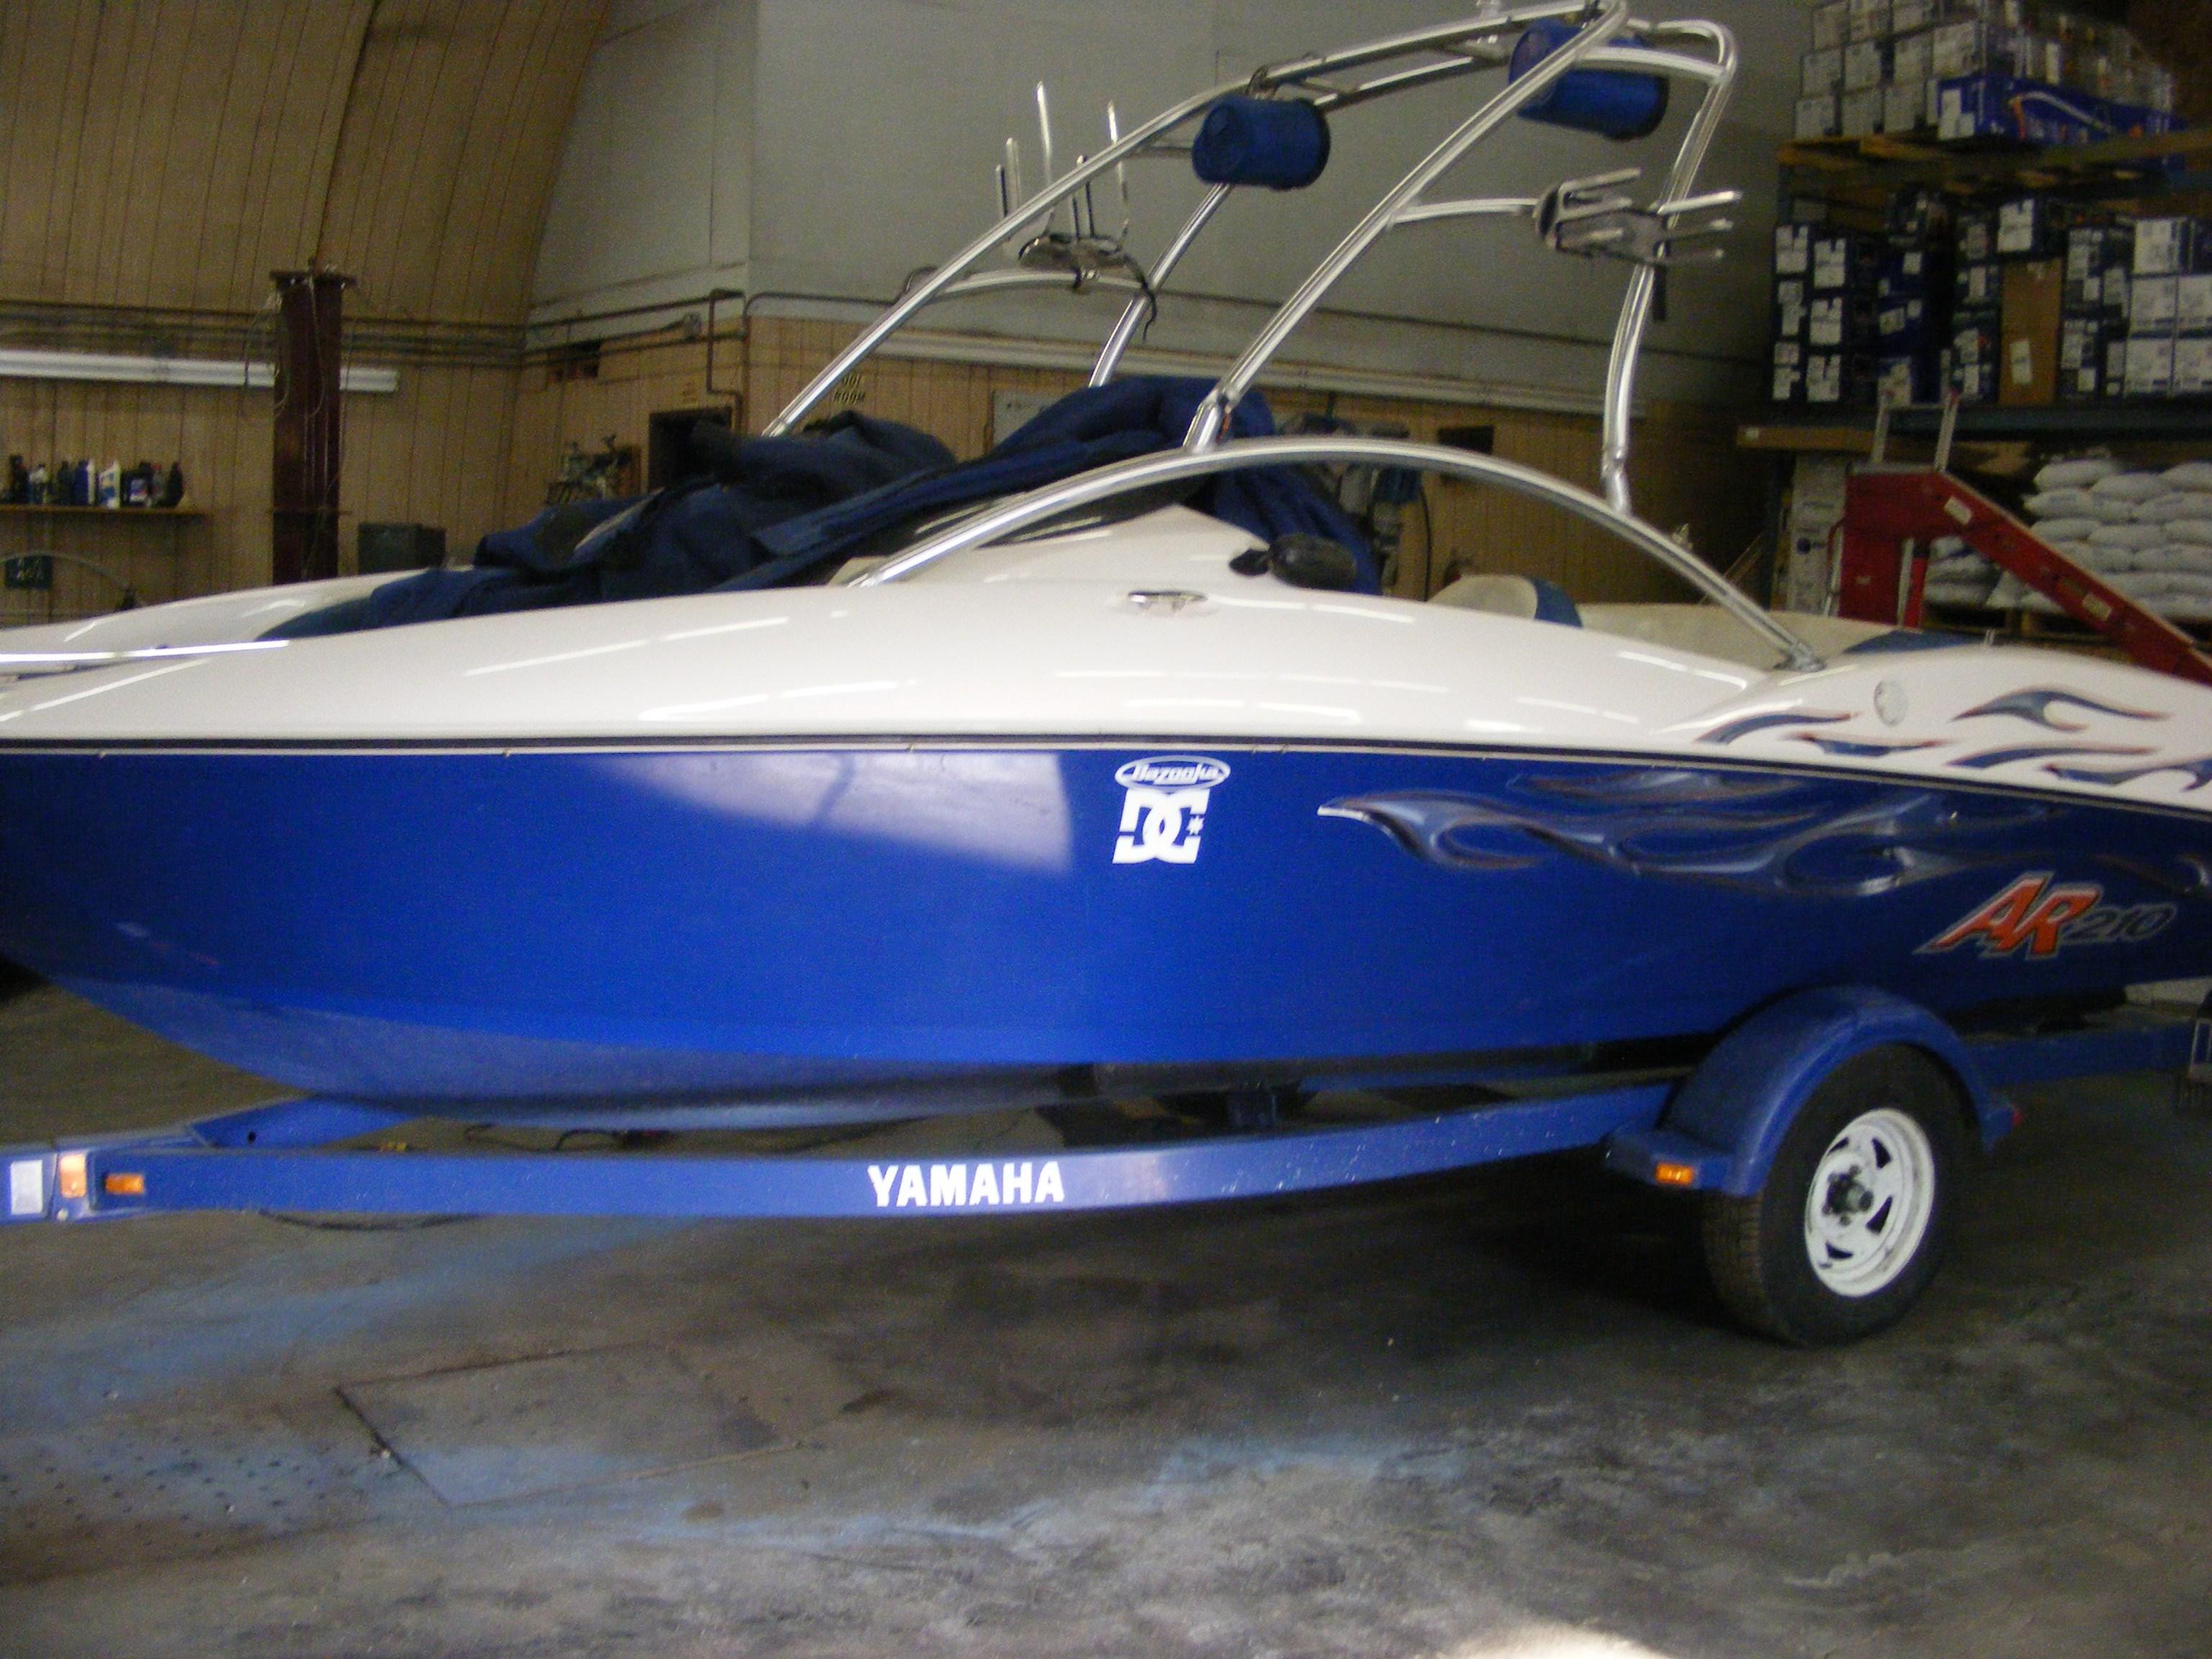 Yamaha ar219 2003 used boat for sale in nanton alberta for Yamaha dealers in arkansas